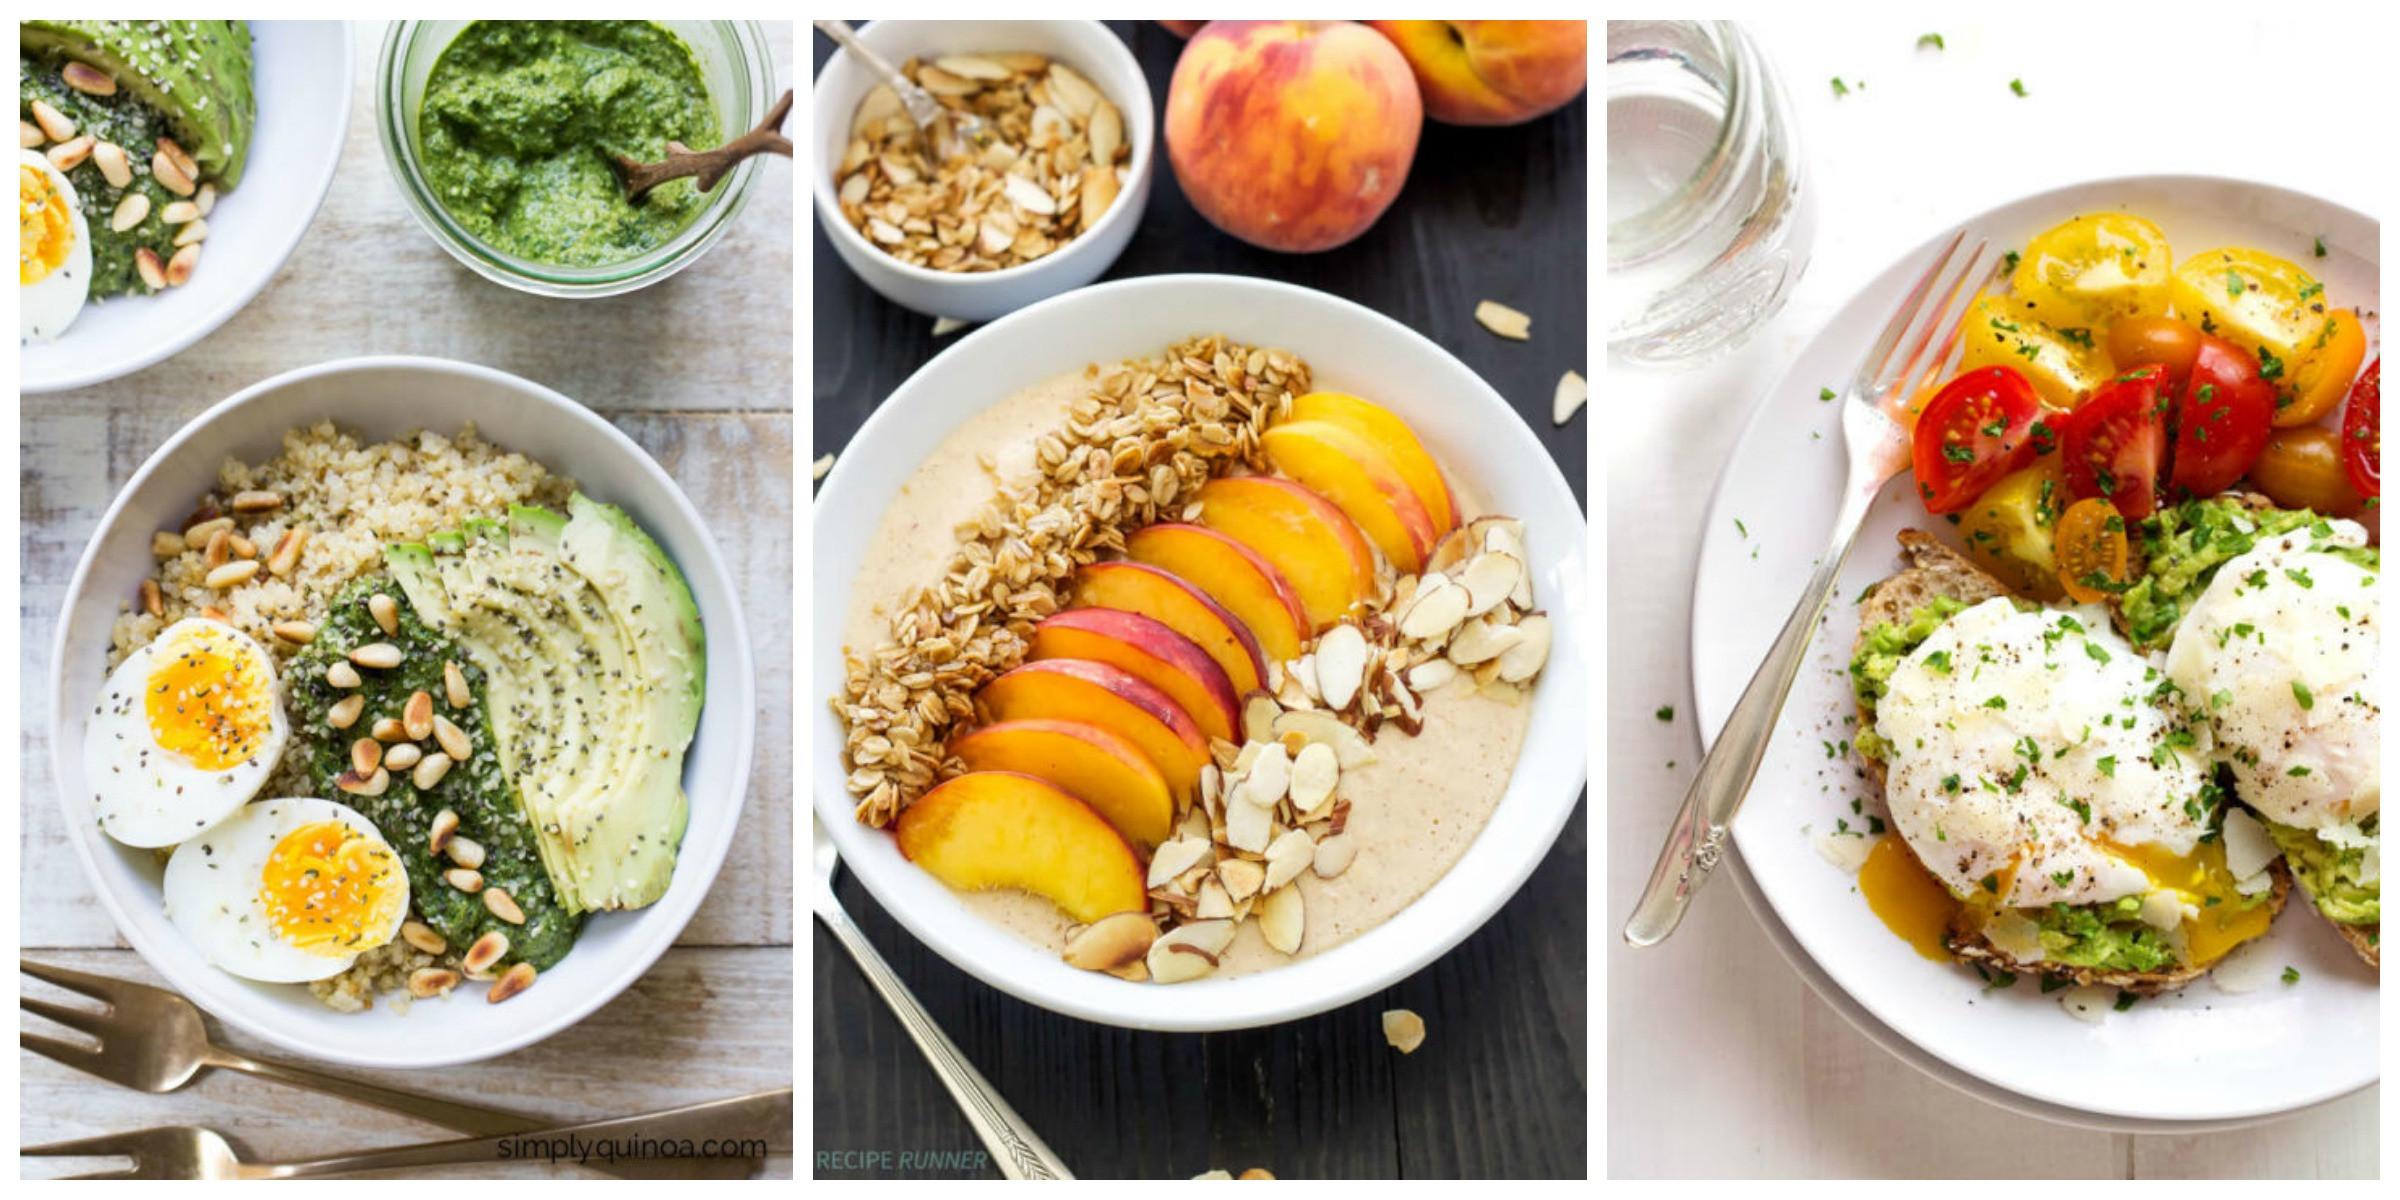 Healthy Breakfast Food  20 Best Healthy Breakfast Food Ideas Recipes for Healthy